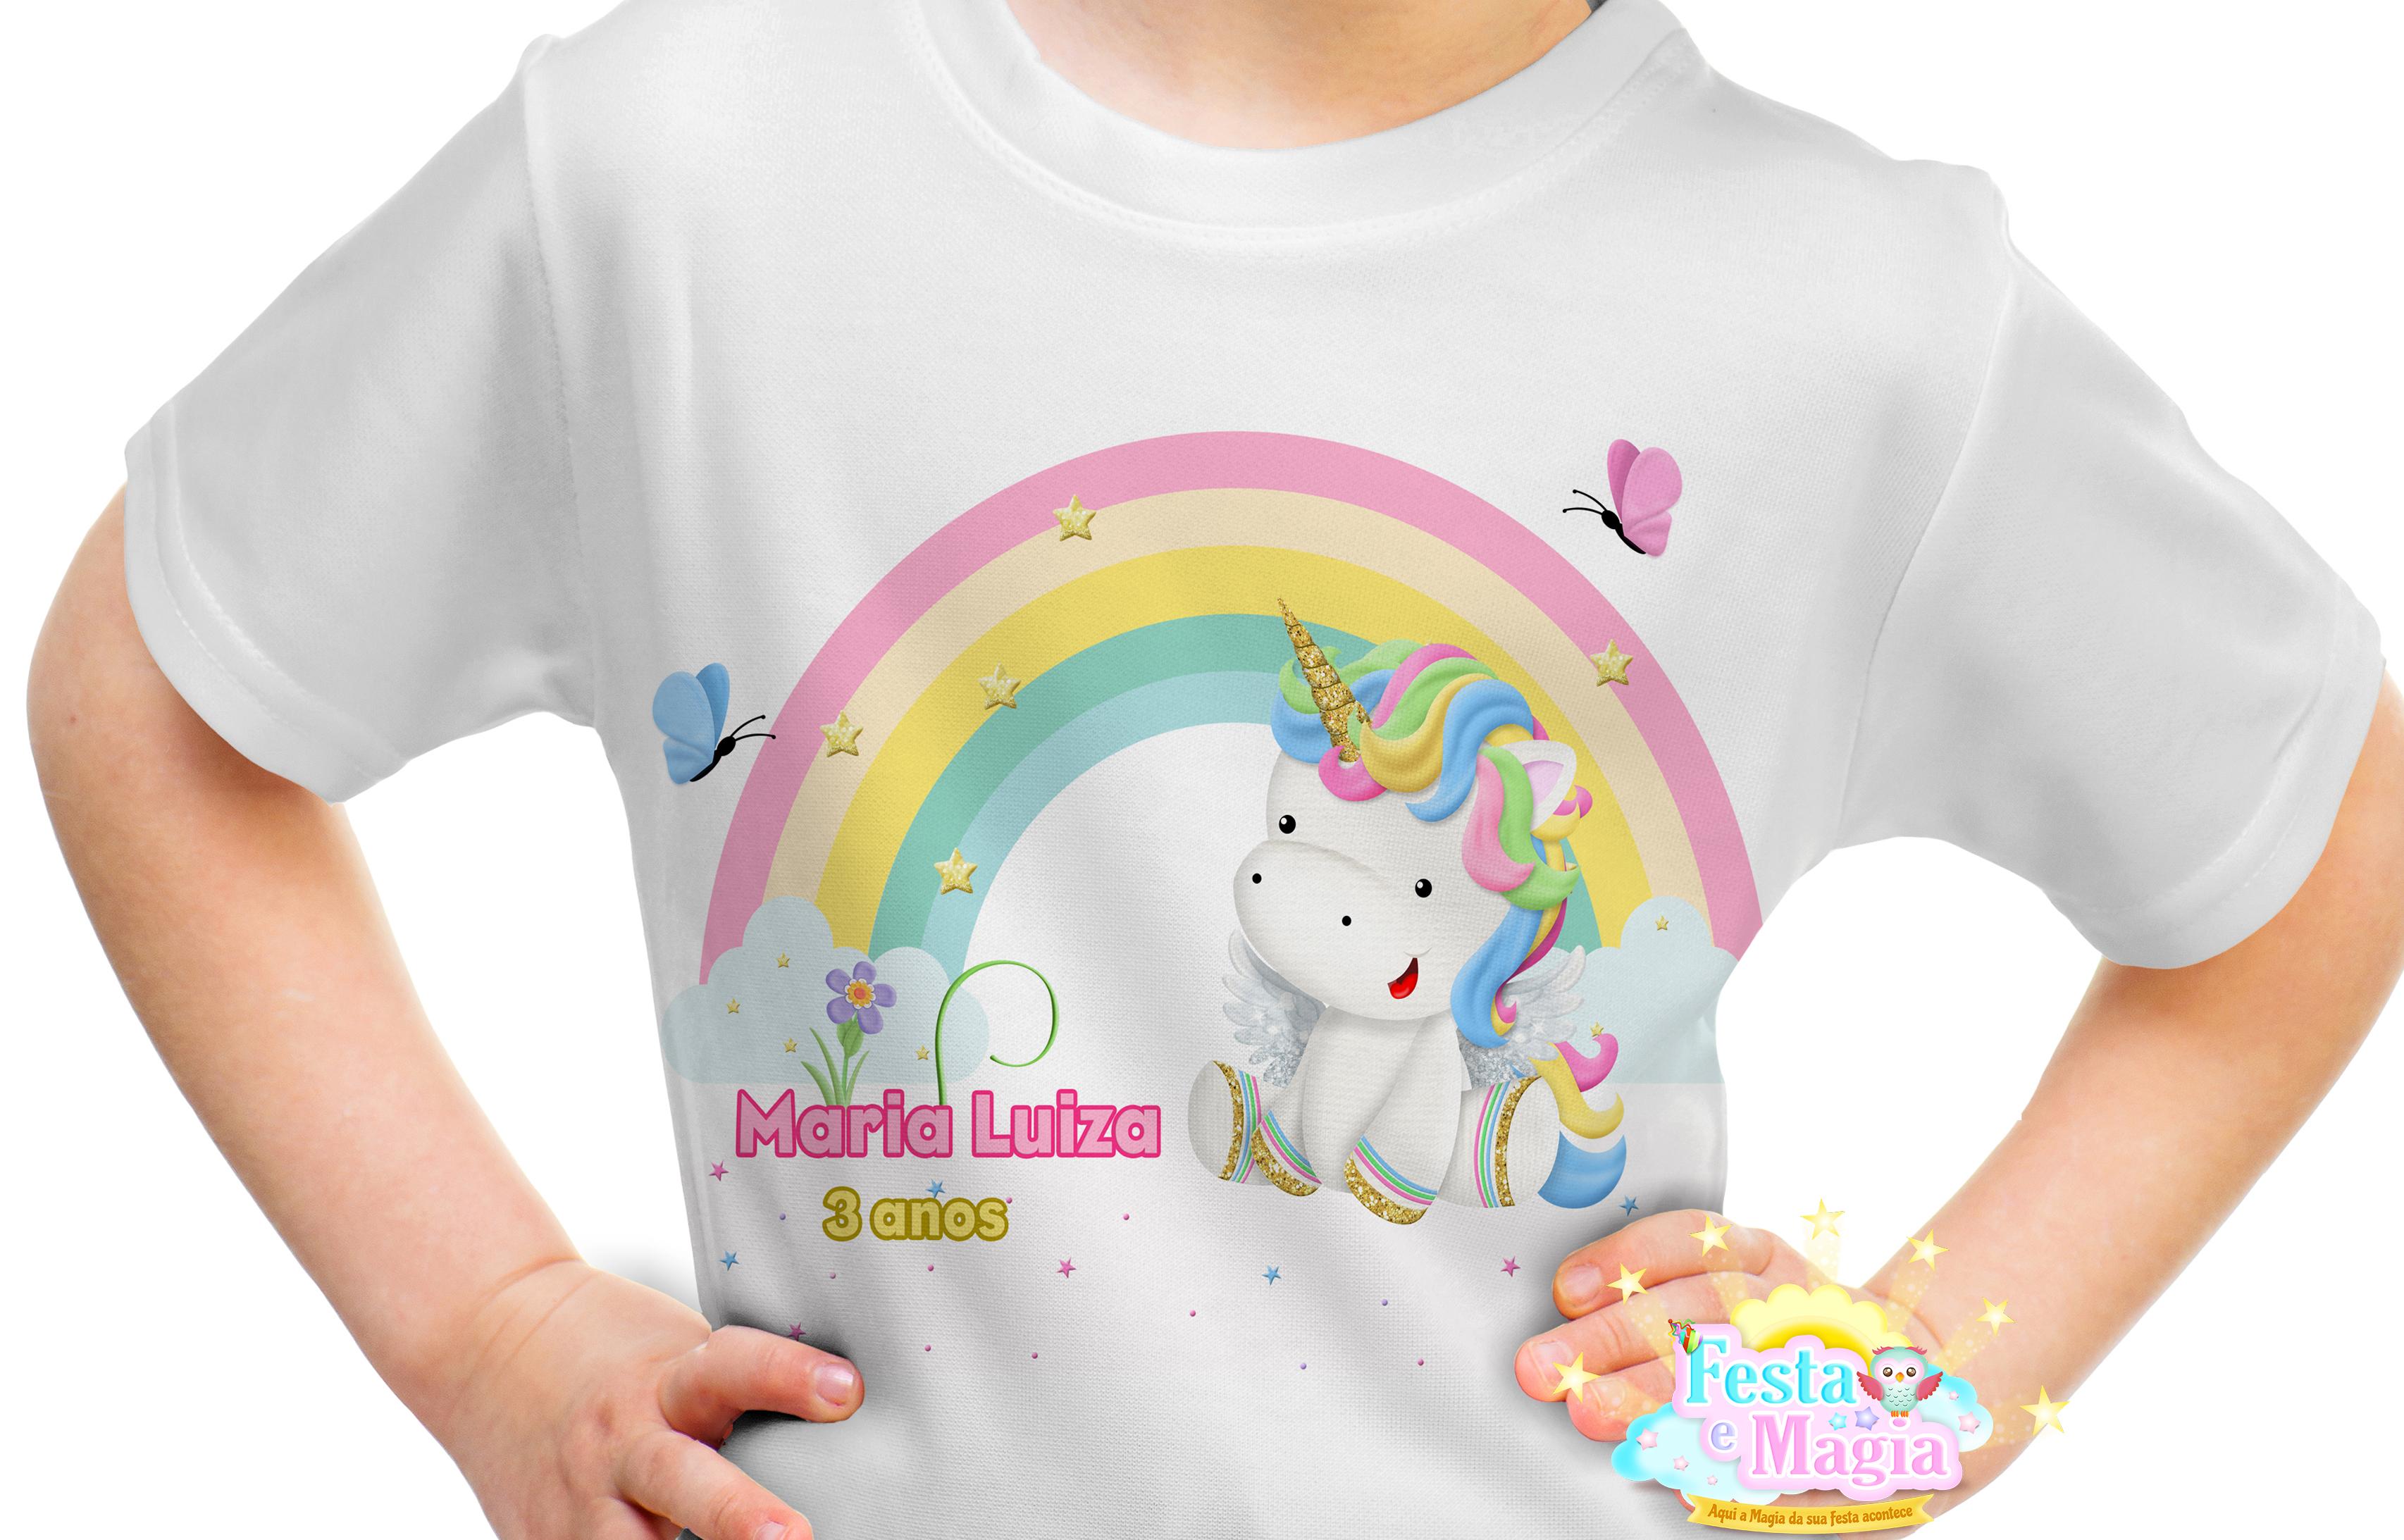 717b2959f Camiseta Personalizada Unicornio no Elo7